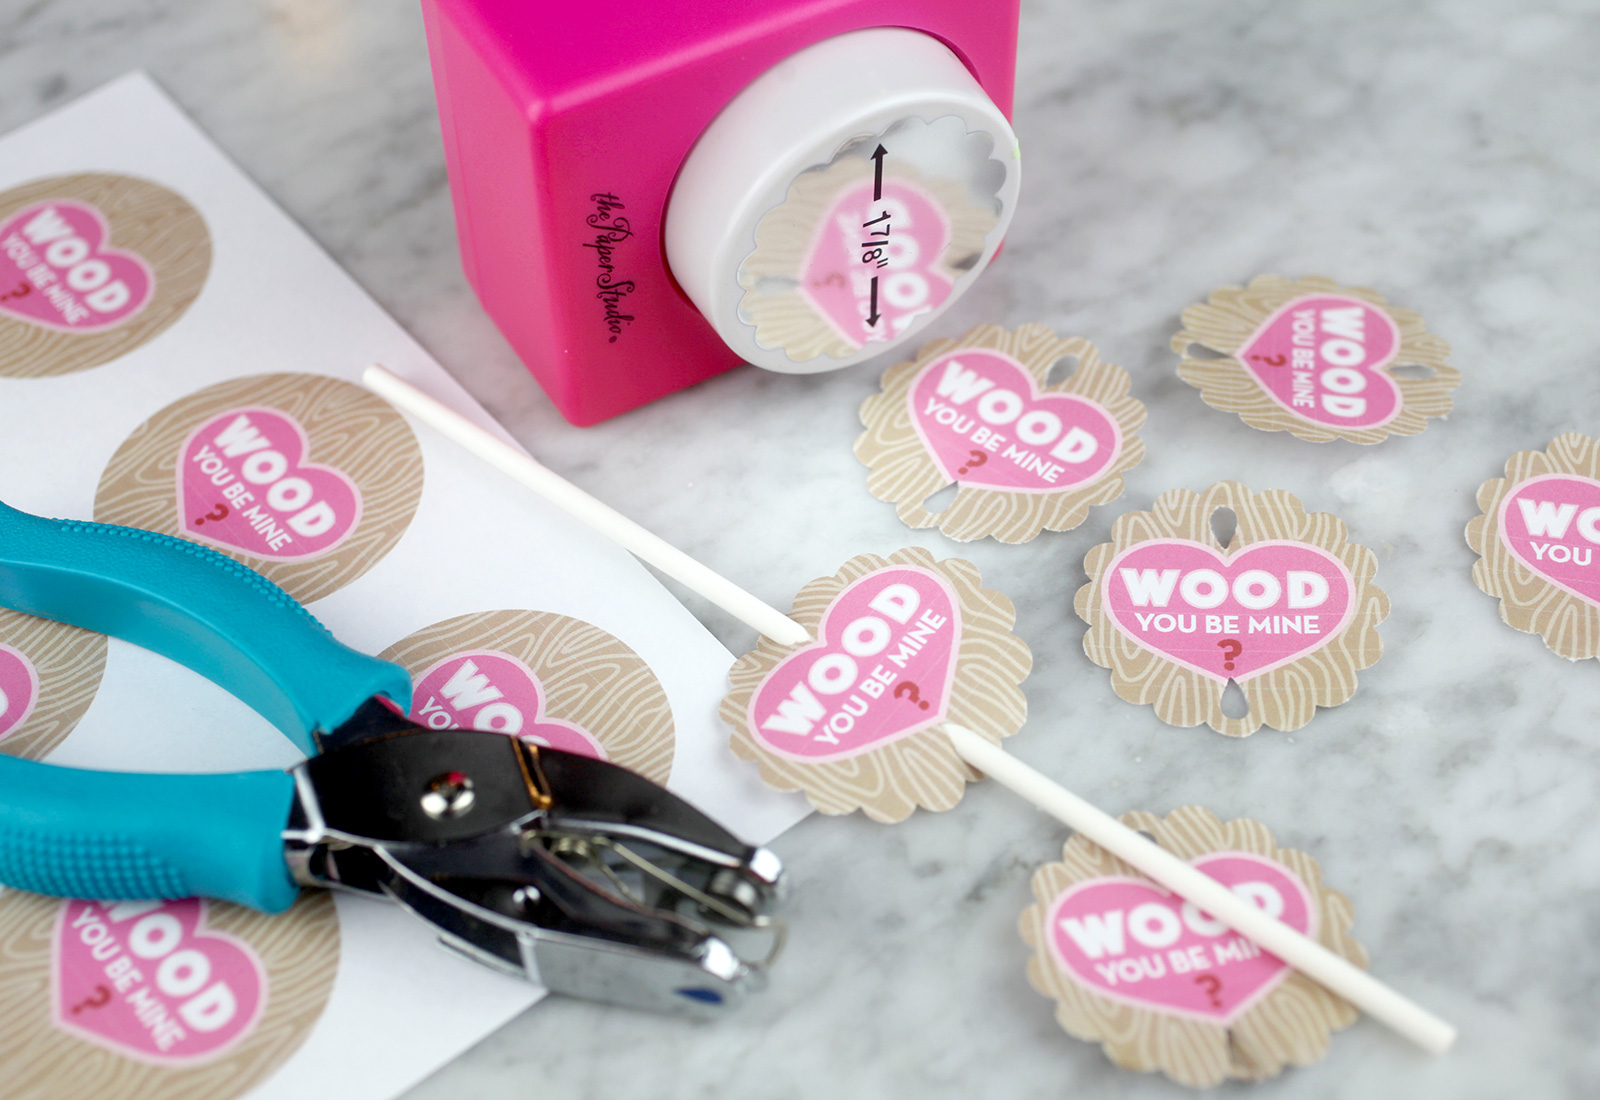 Wood you be mine? Treat tags